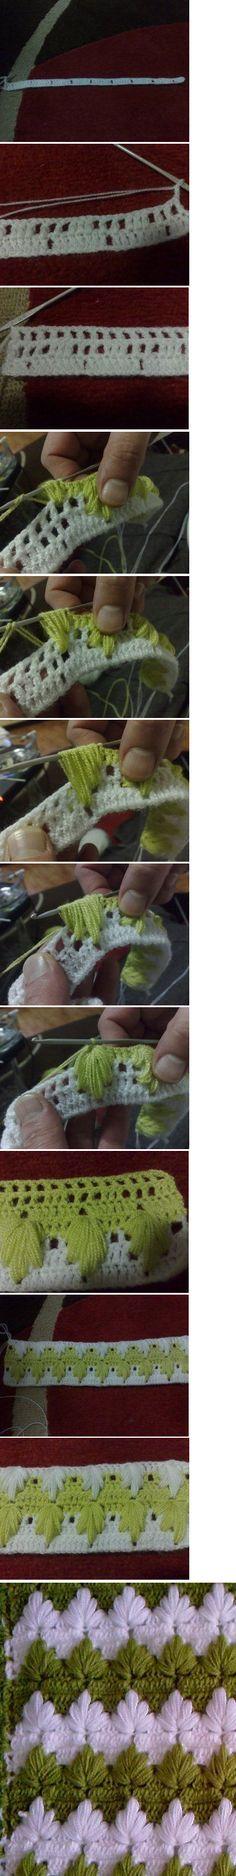 Omg. LOVE!  http://lifebabysapatinhos.blogspot.com/2011/12/passo-passo-ponto-maravilhoso-para.html <-- Instructions here.  Makes a shell-type afghan. #crochet #crochetstitch #shellstitch